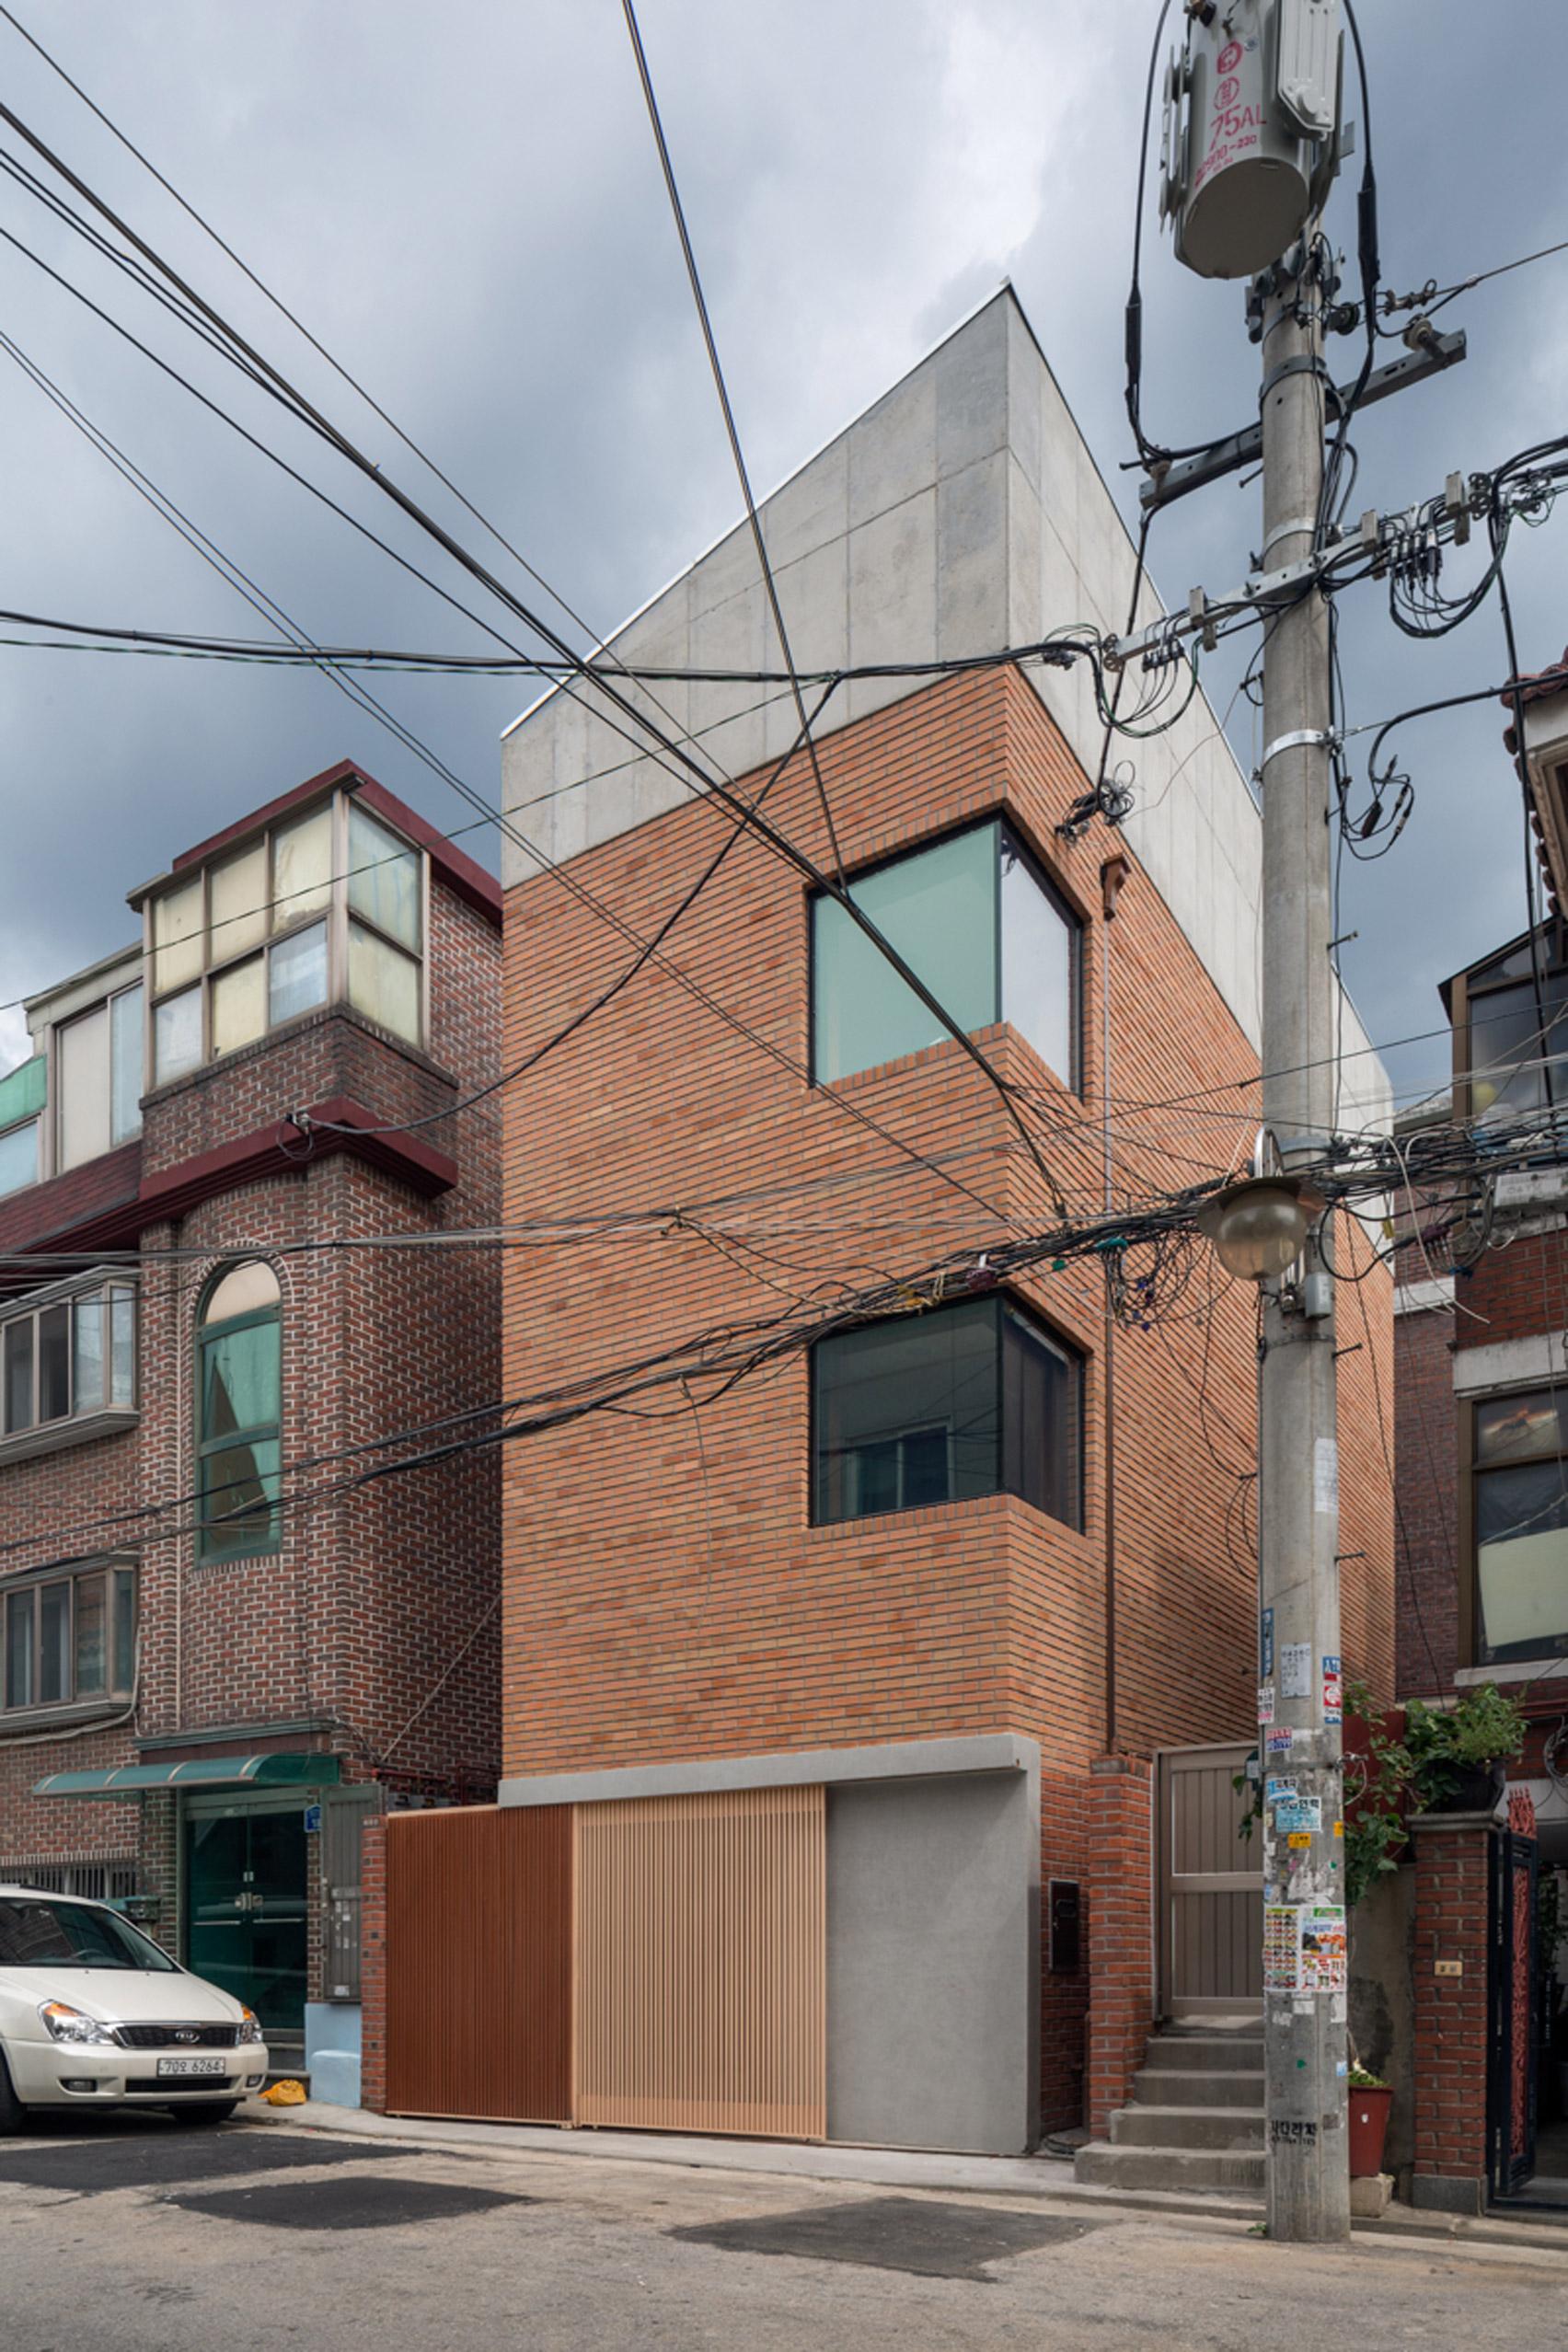 grown-house-fhhh-friends-architecture-residential-seoul-south-korea_dezeen_1704_col_25